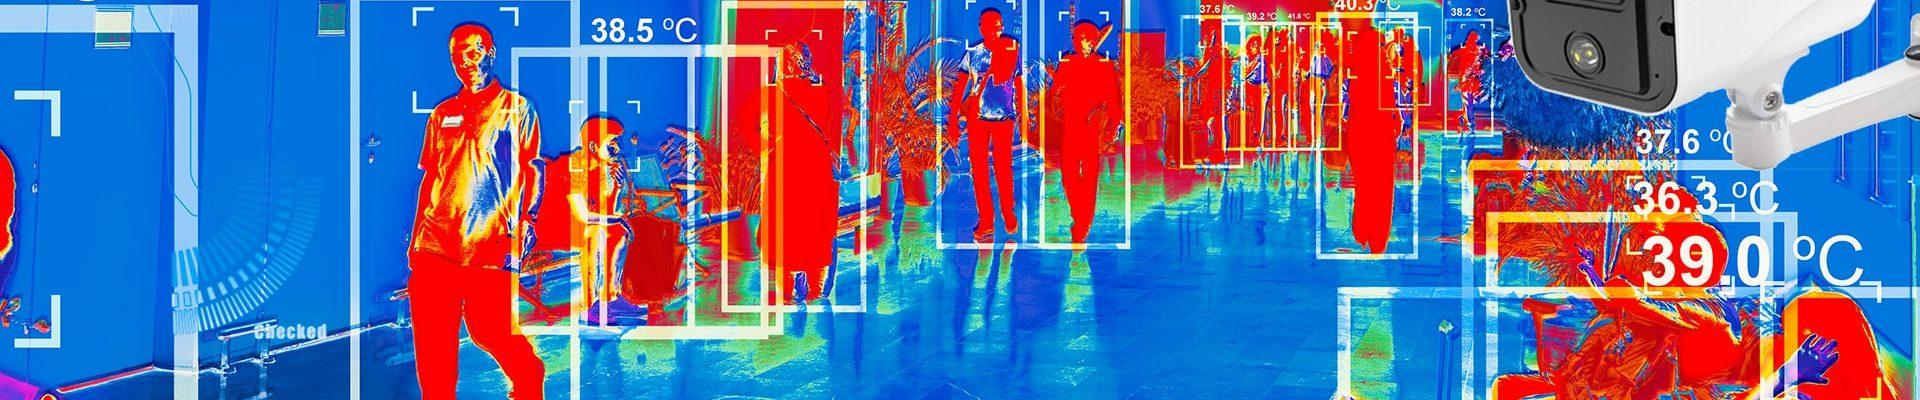 Body Temperature Thermal Cameras